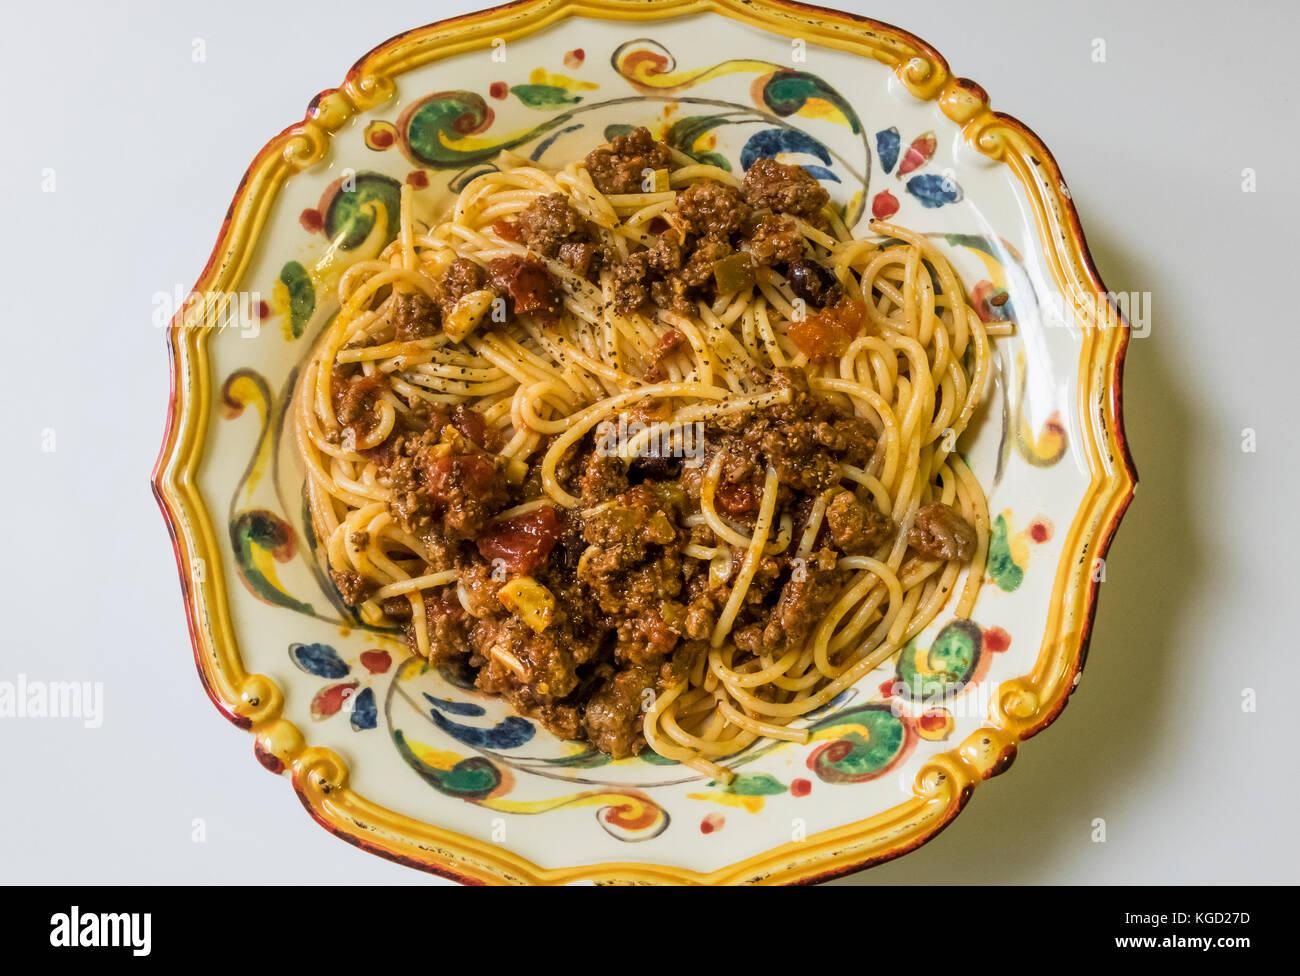 Spaghetti Bolognese in an ornate Italian pasta bowl - Stock Image